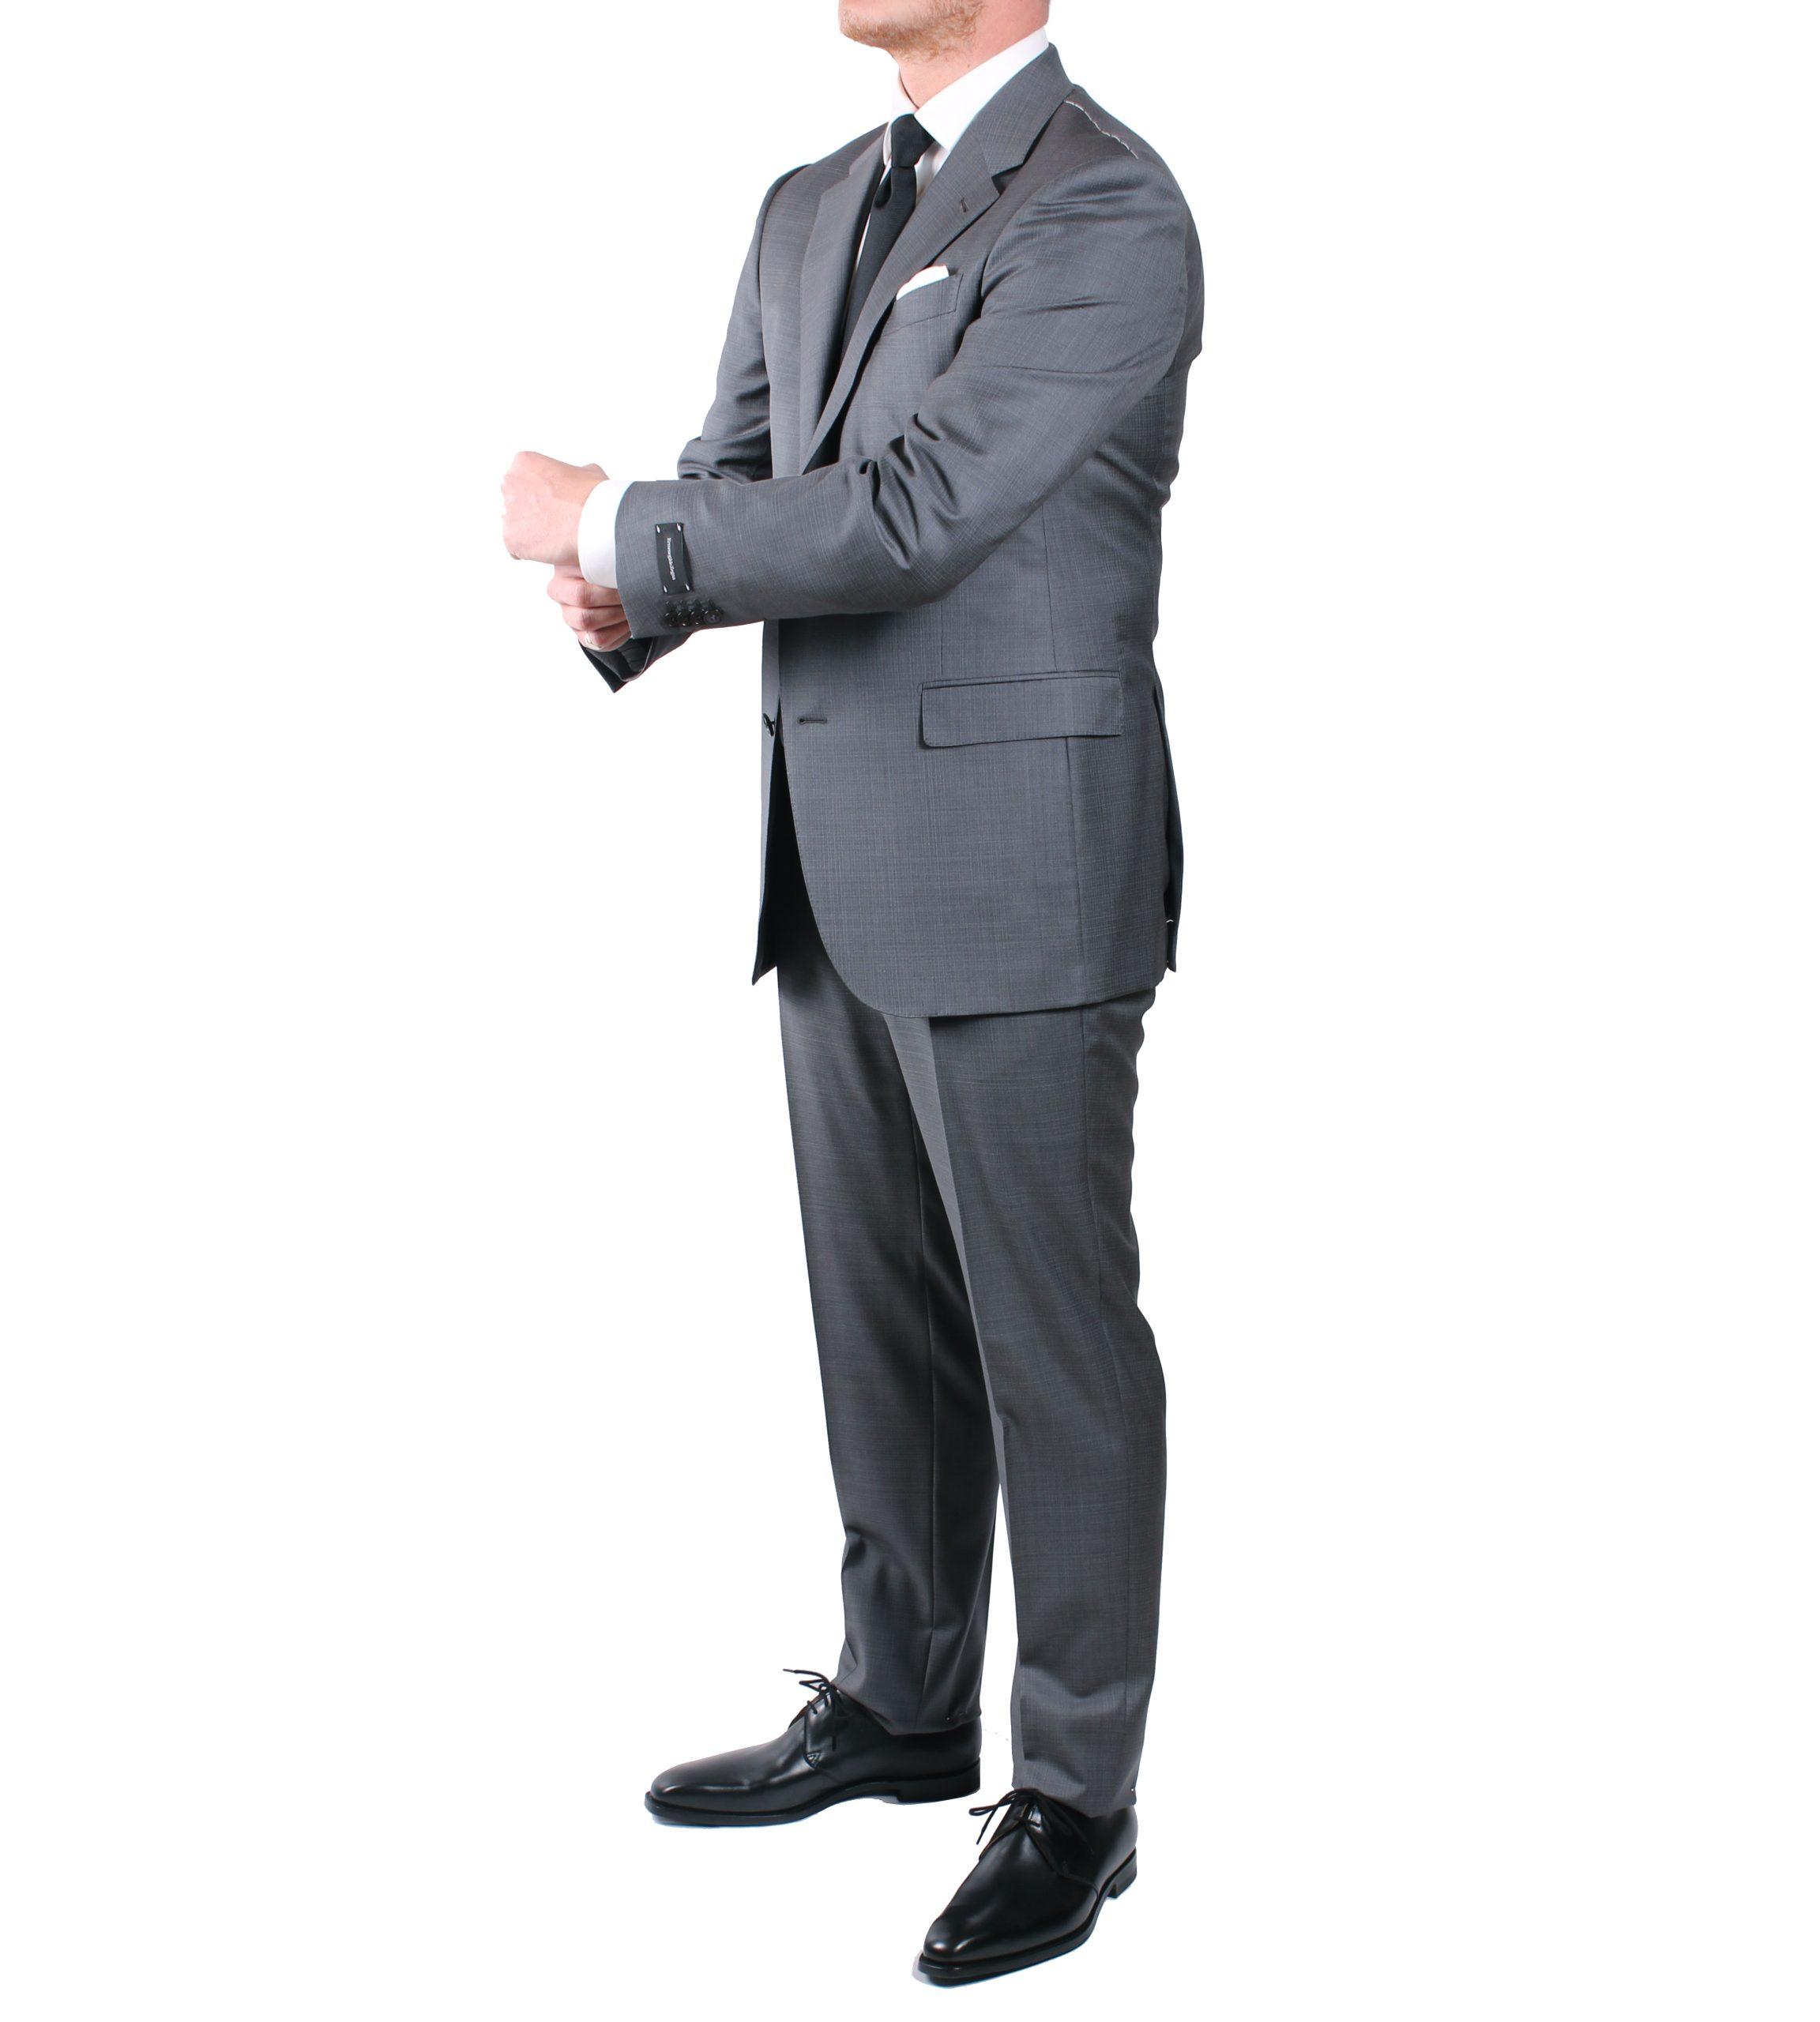 james bond highbury outfit